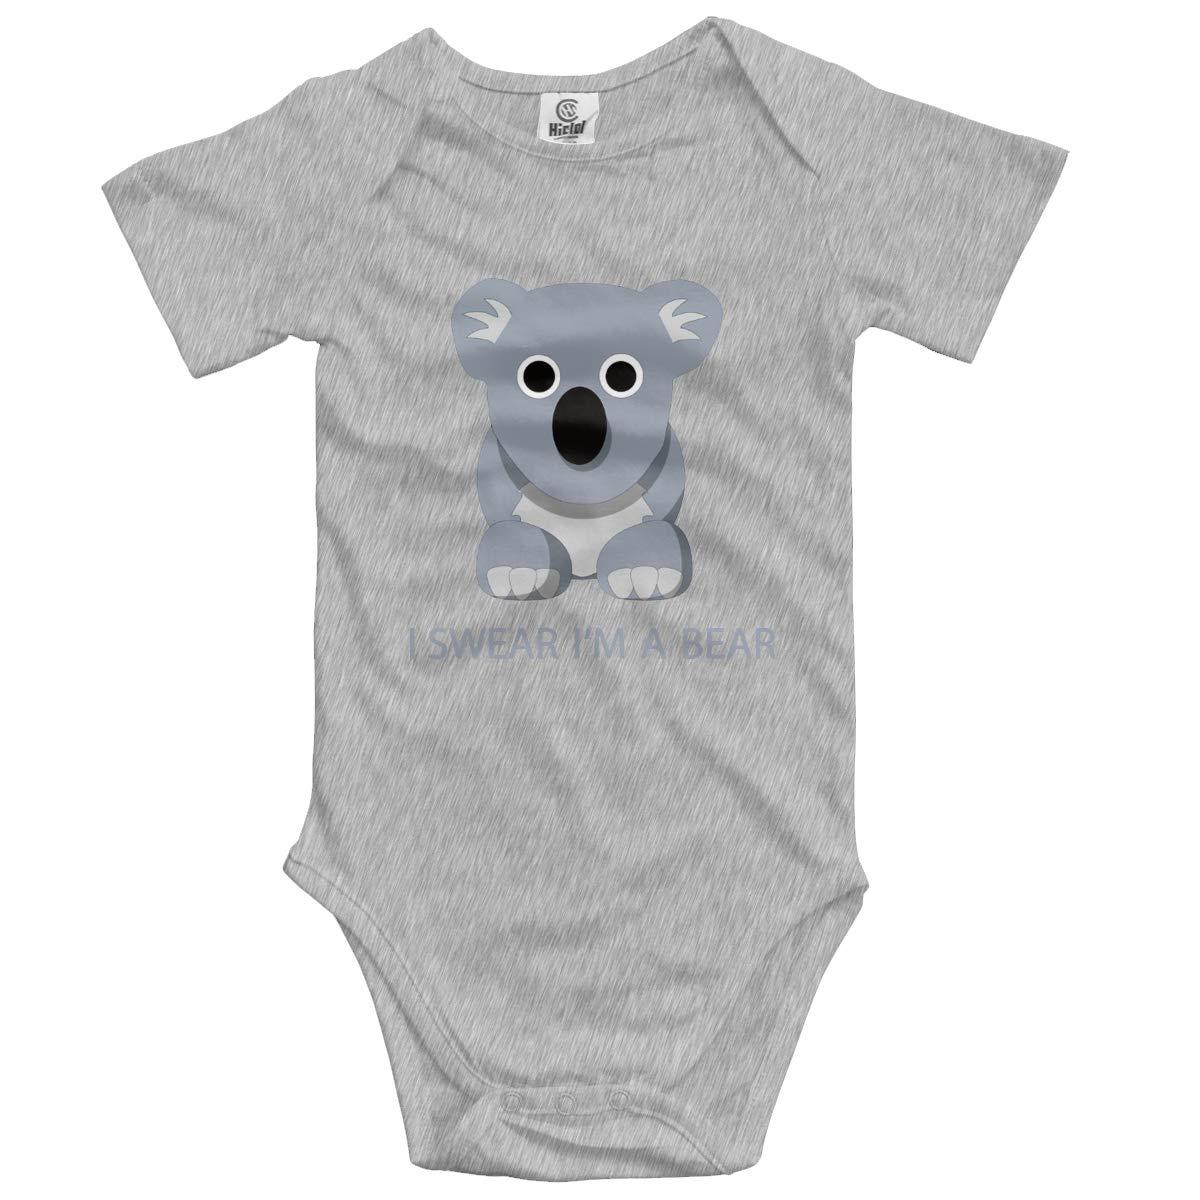 CHETI I Swear Im A Bear Newborn Infant Toddler Baby Girls Boys Bodysuit Short Sleeve 0-24 MonthsBlack